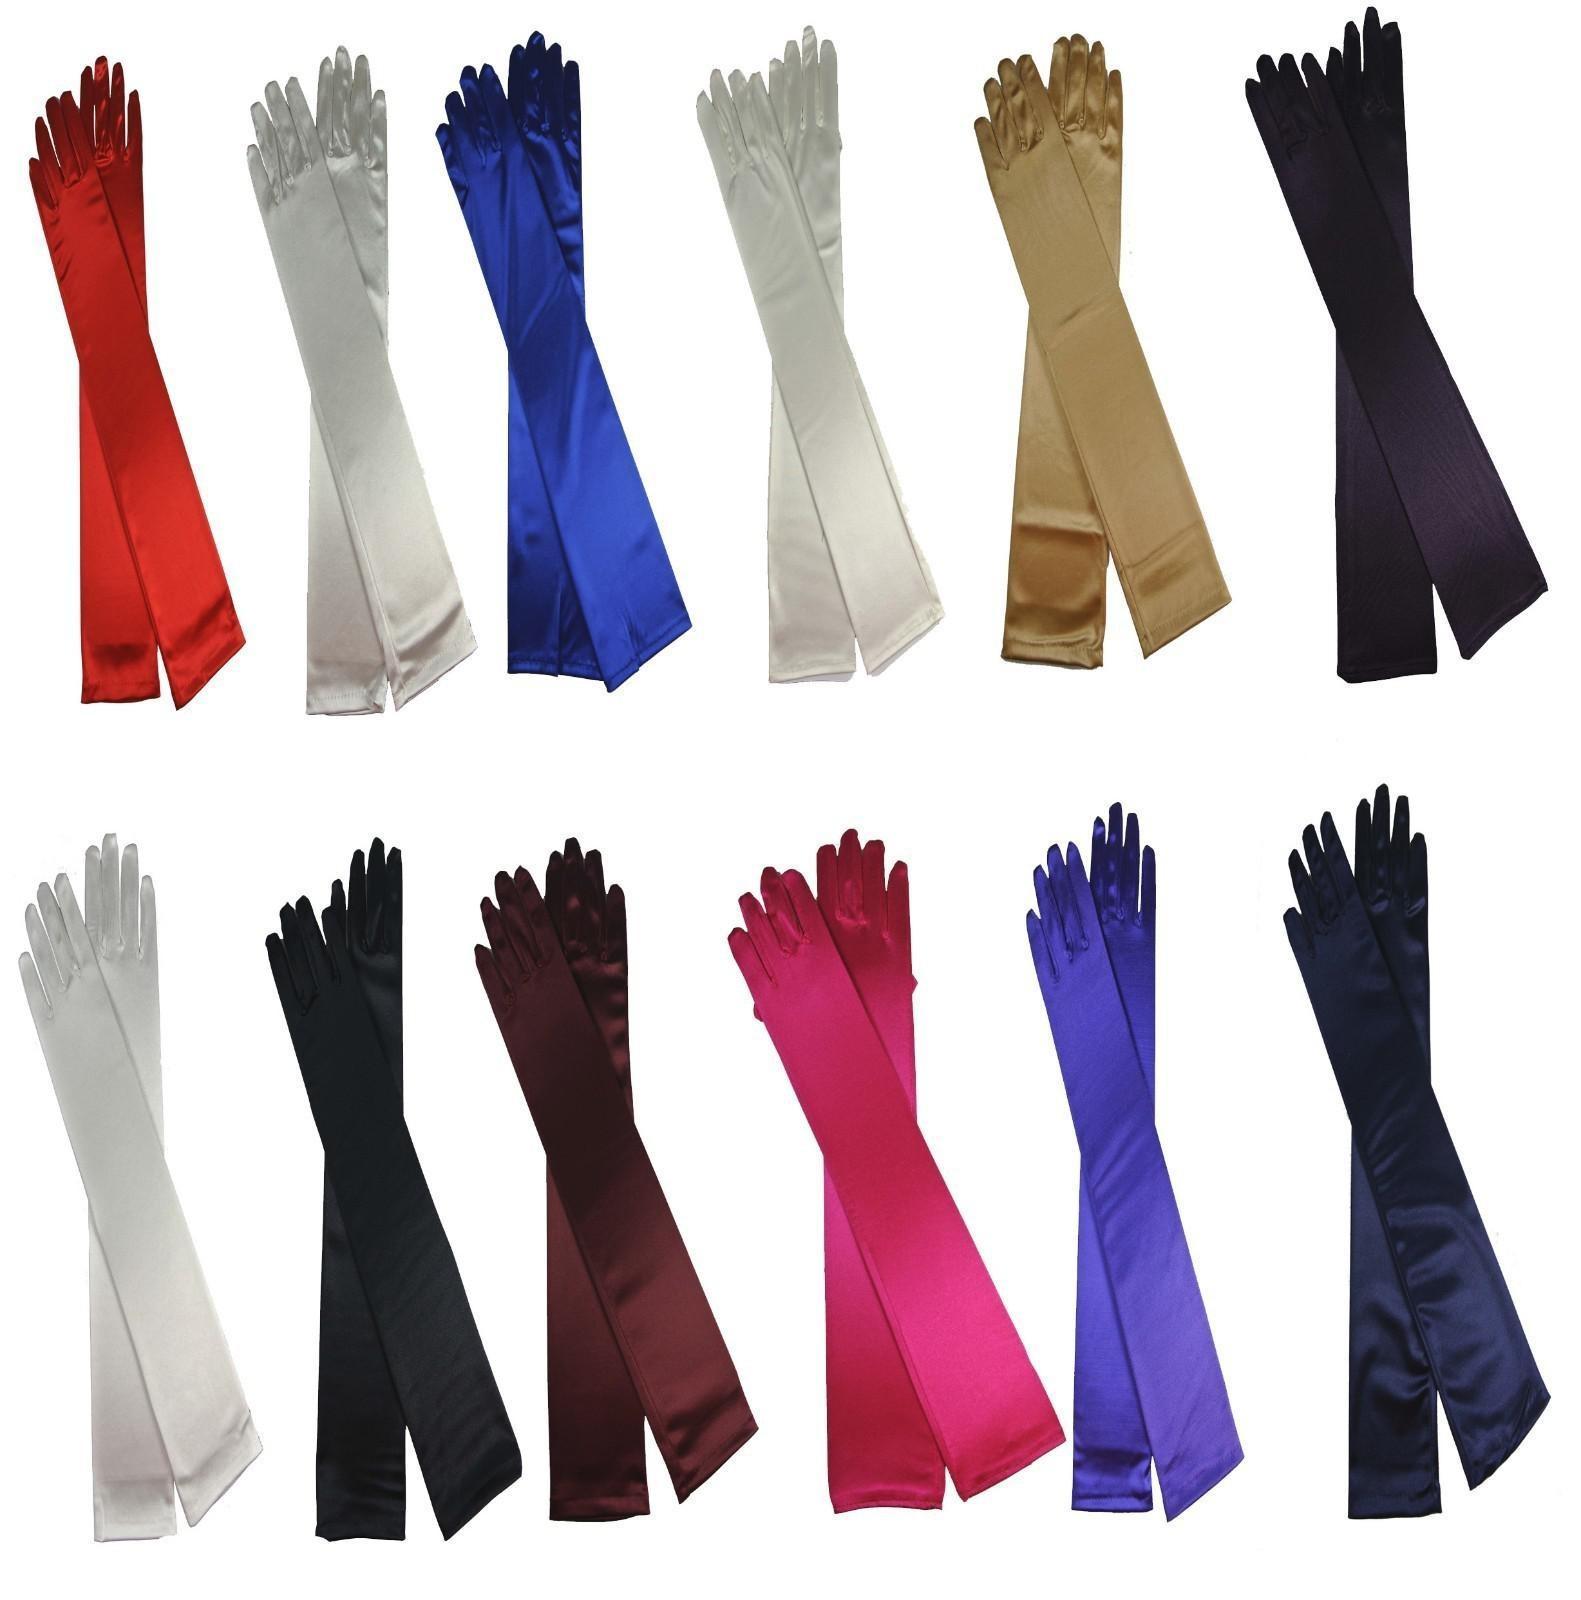 Black gloves evening wear - In Stock White Black Satin Gloves Evening Golves Opera Arm Long Gloves 22 Purple Wedding